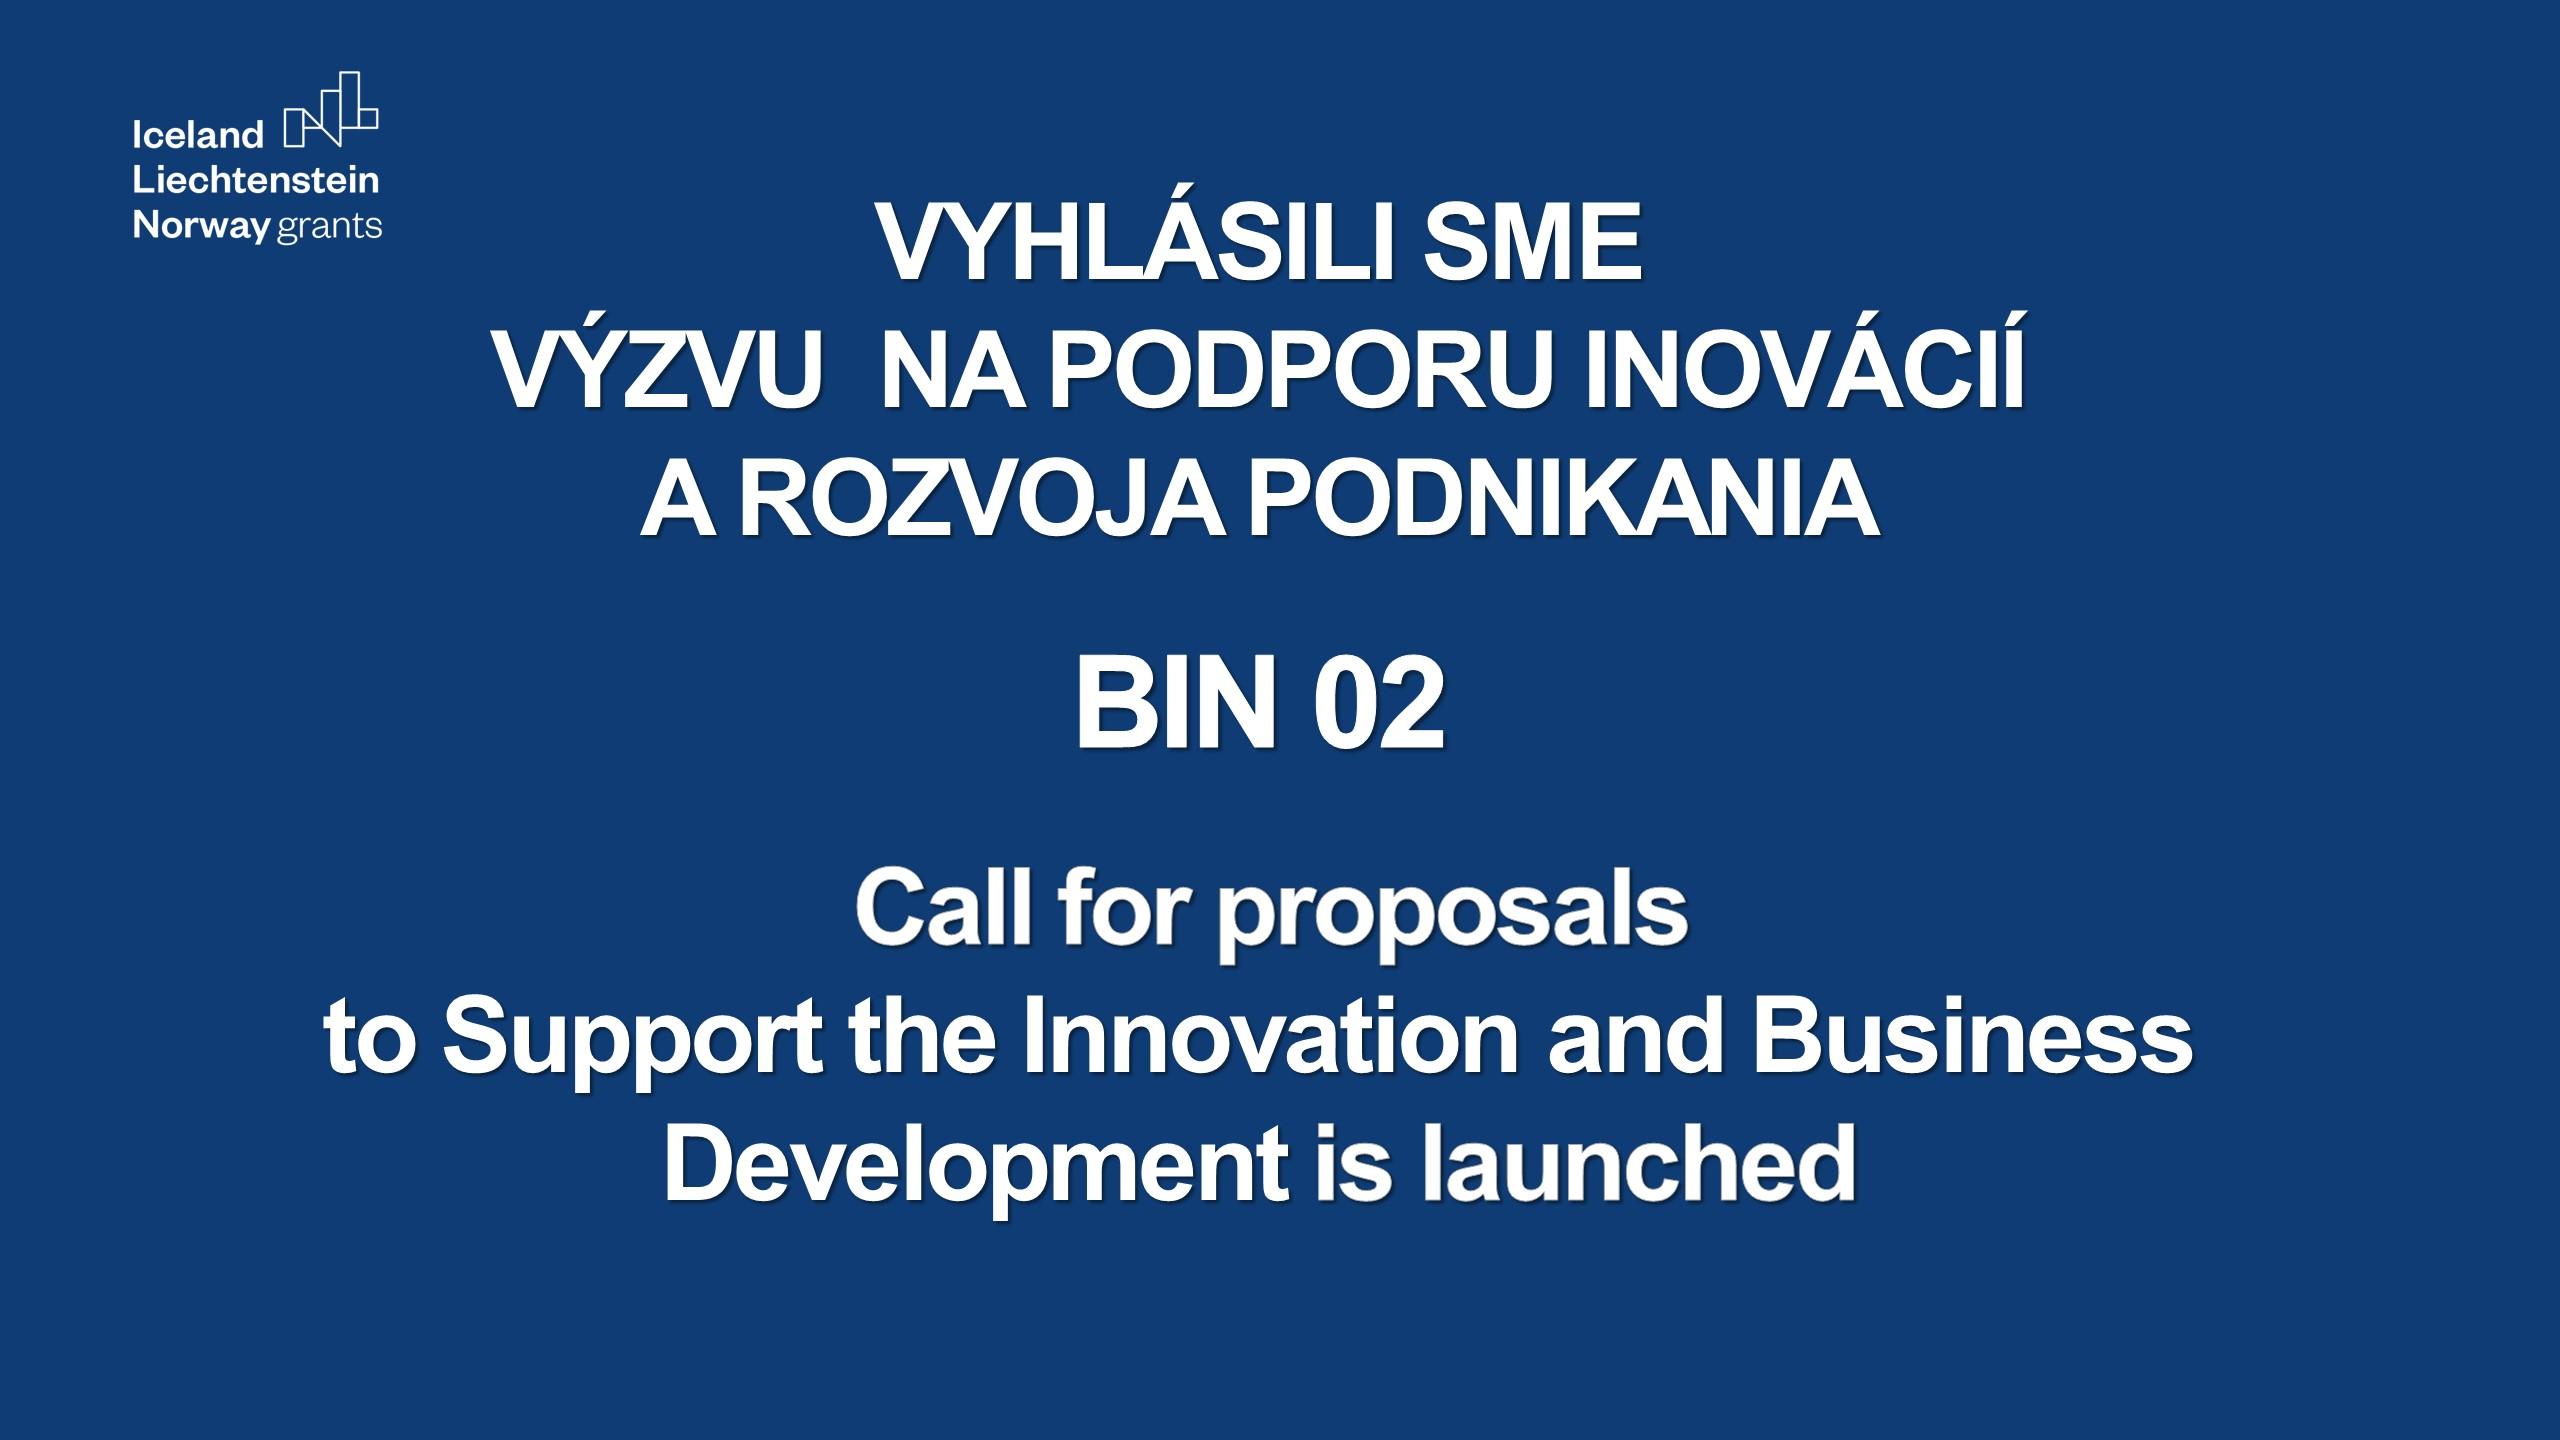 Banner_vyhlasili-sme-vyzvu-BIN02-modra-OPRAVA